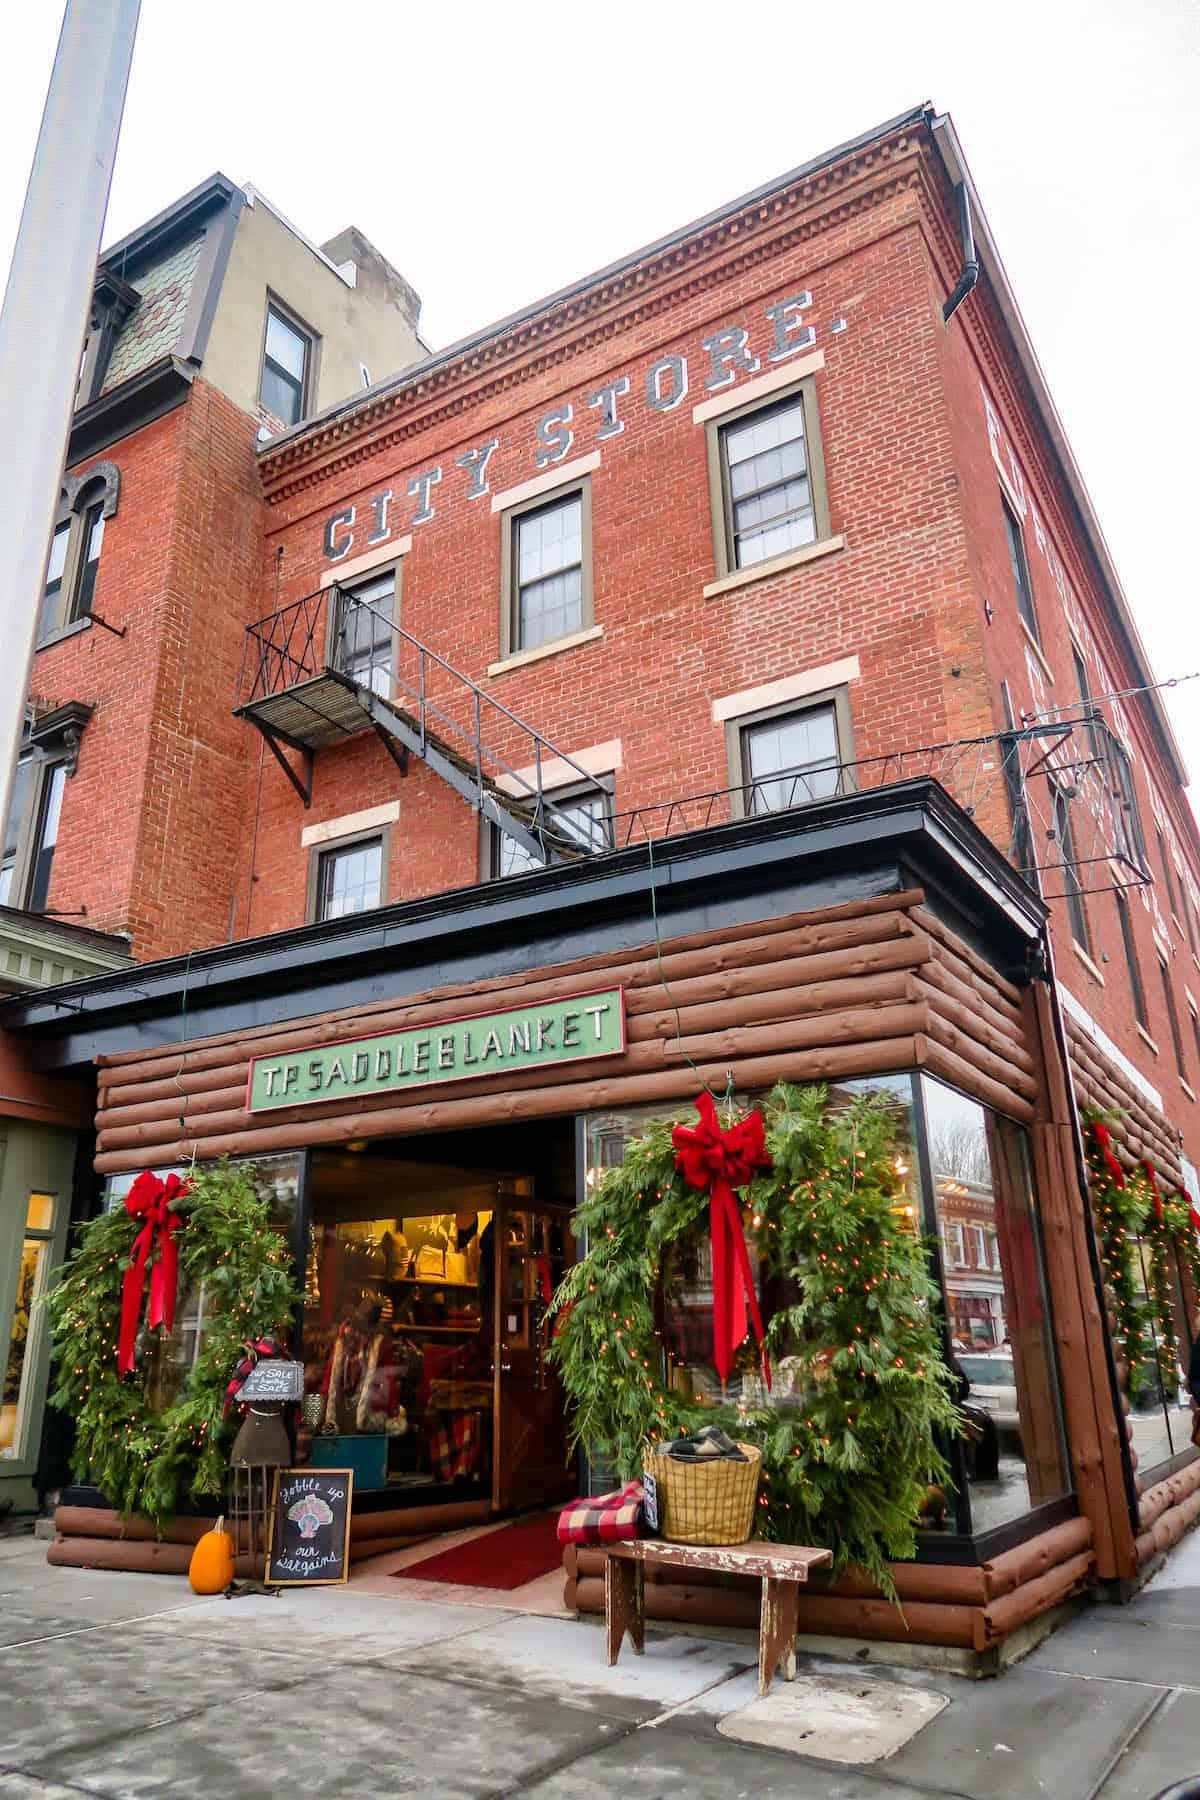 Great Barrington Massachusetts at Christmas